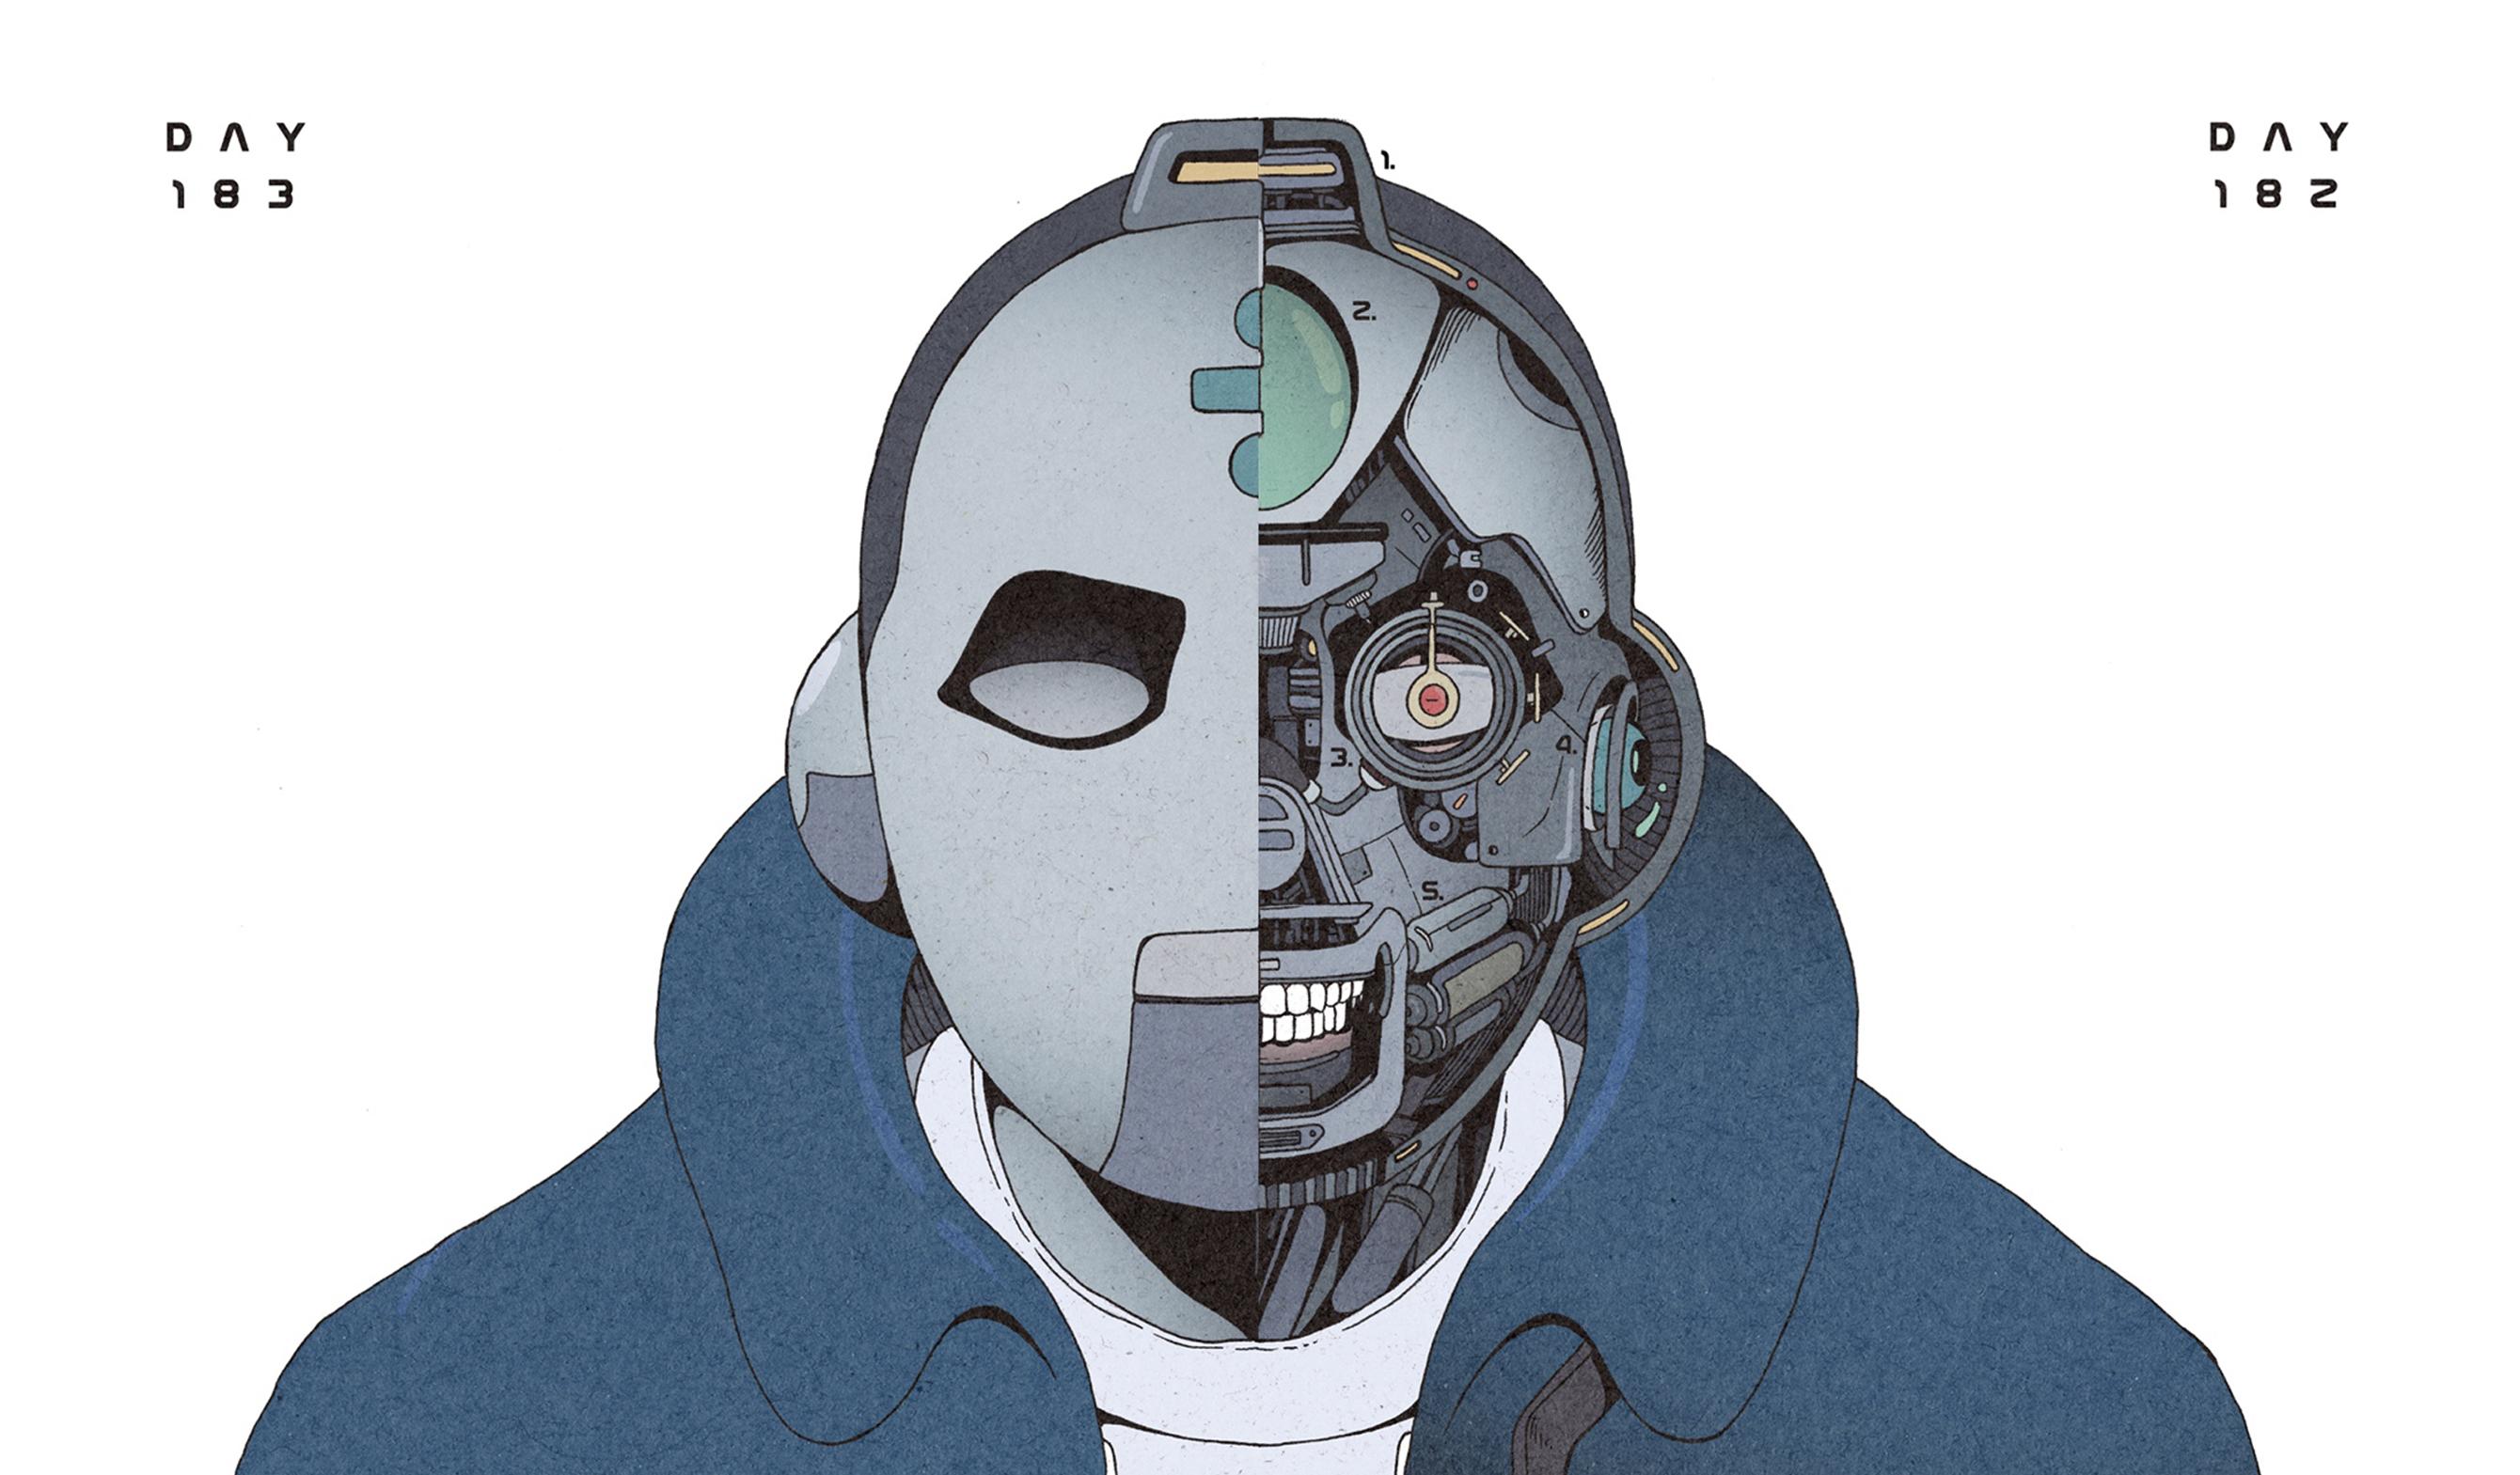 dirty-robot-daniel-isles-futurism-sci-fi-ficcao-cientifica-arte-ilustracao-quadrinhos- (11)